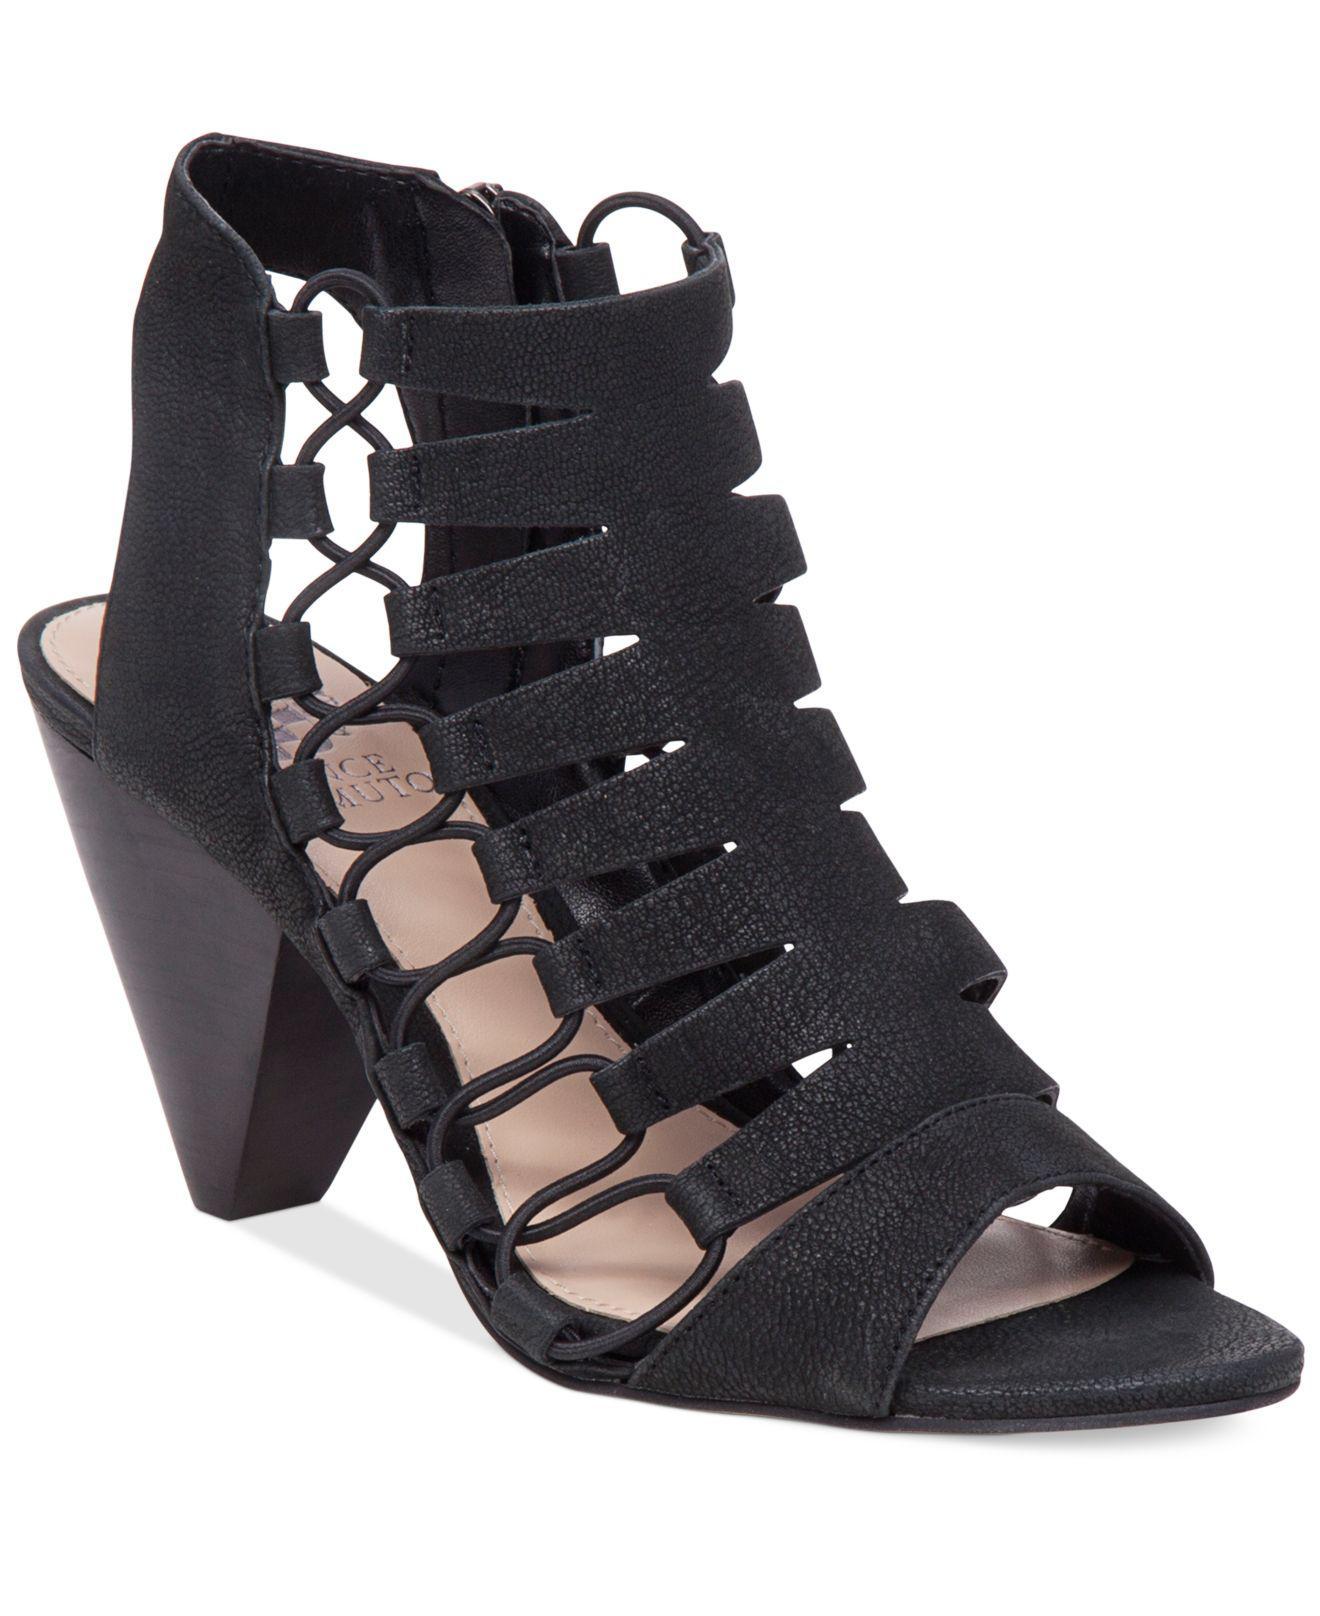 Vince Camuto Leather Eliaz Gladiator Dress Sandals In